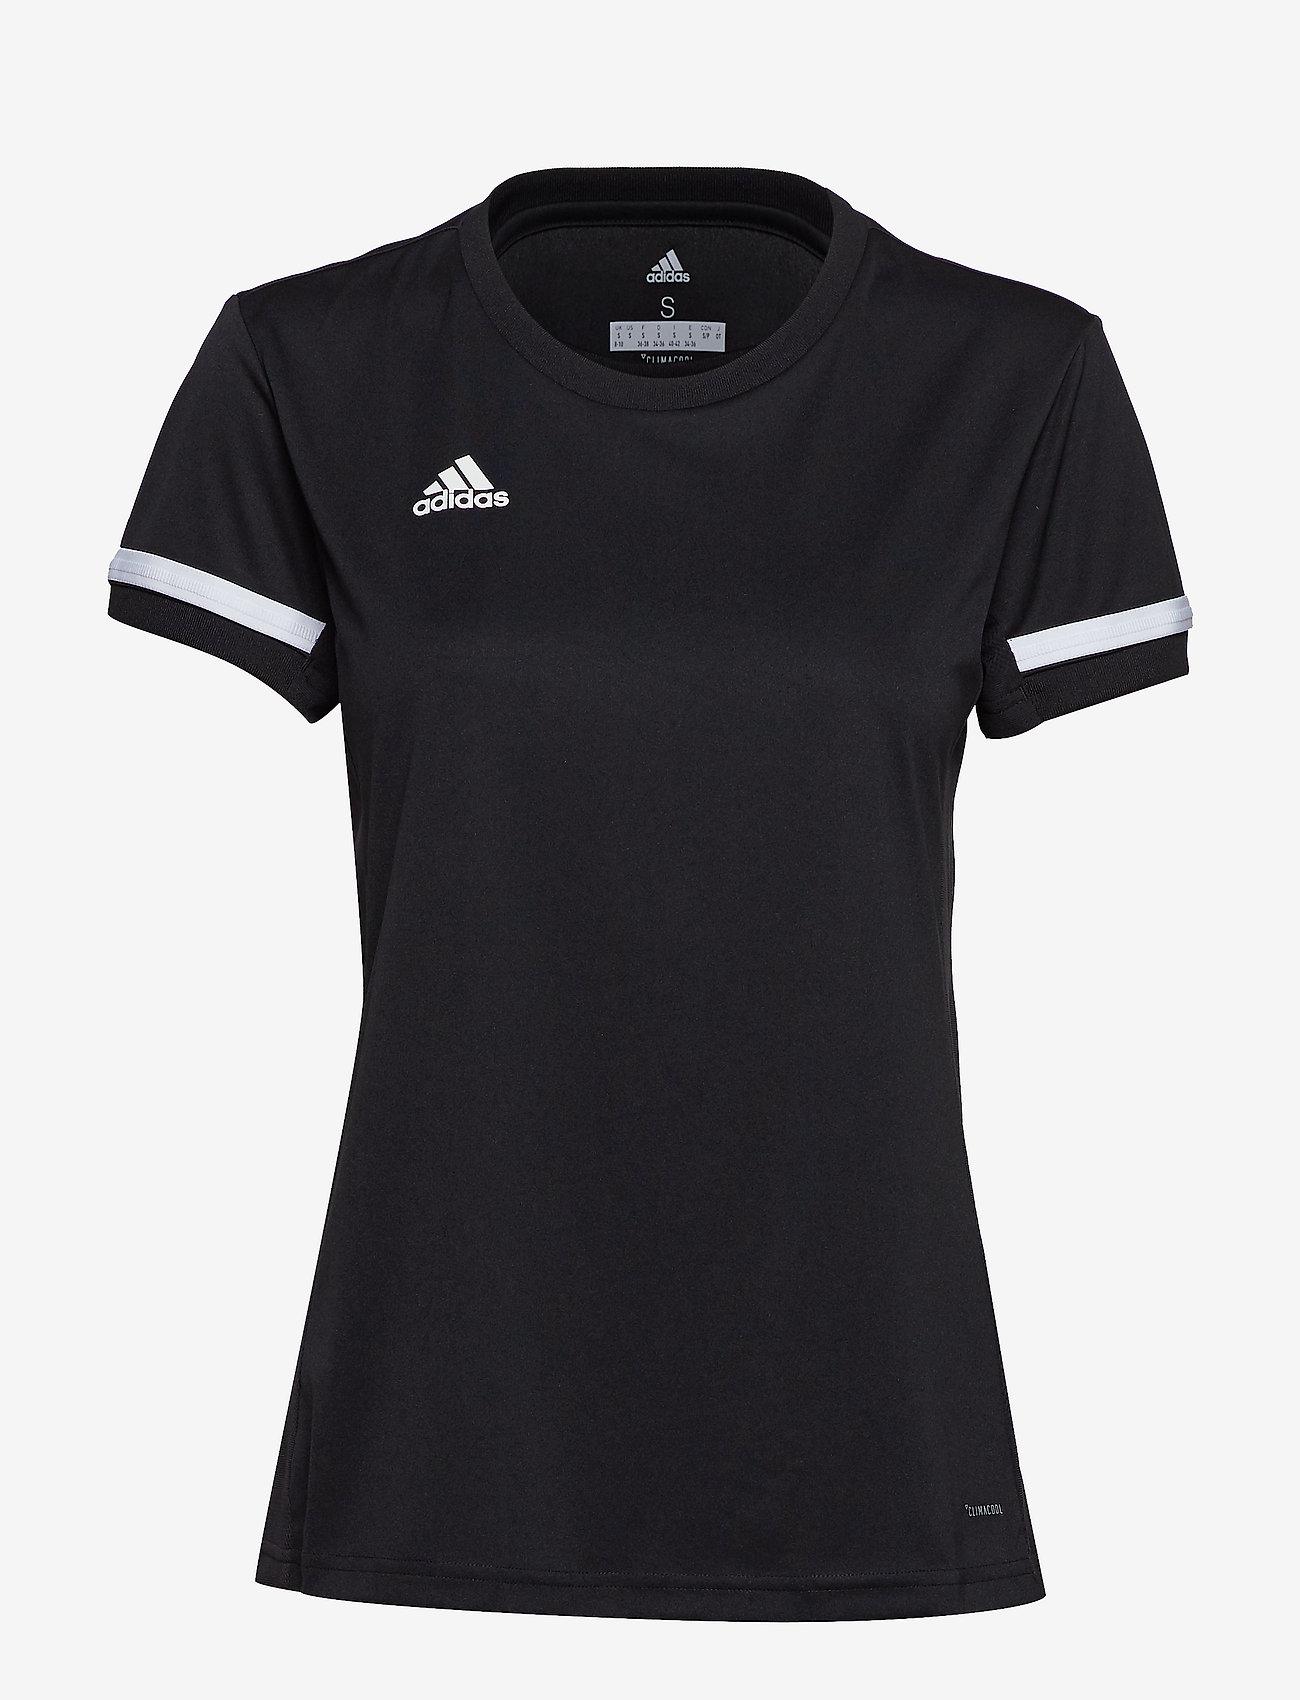 adidas Performance - Team 19 Jersey W - football shirts - black/white - 0